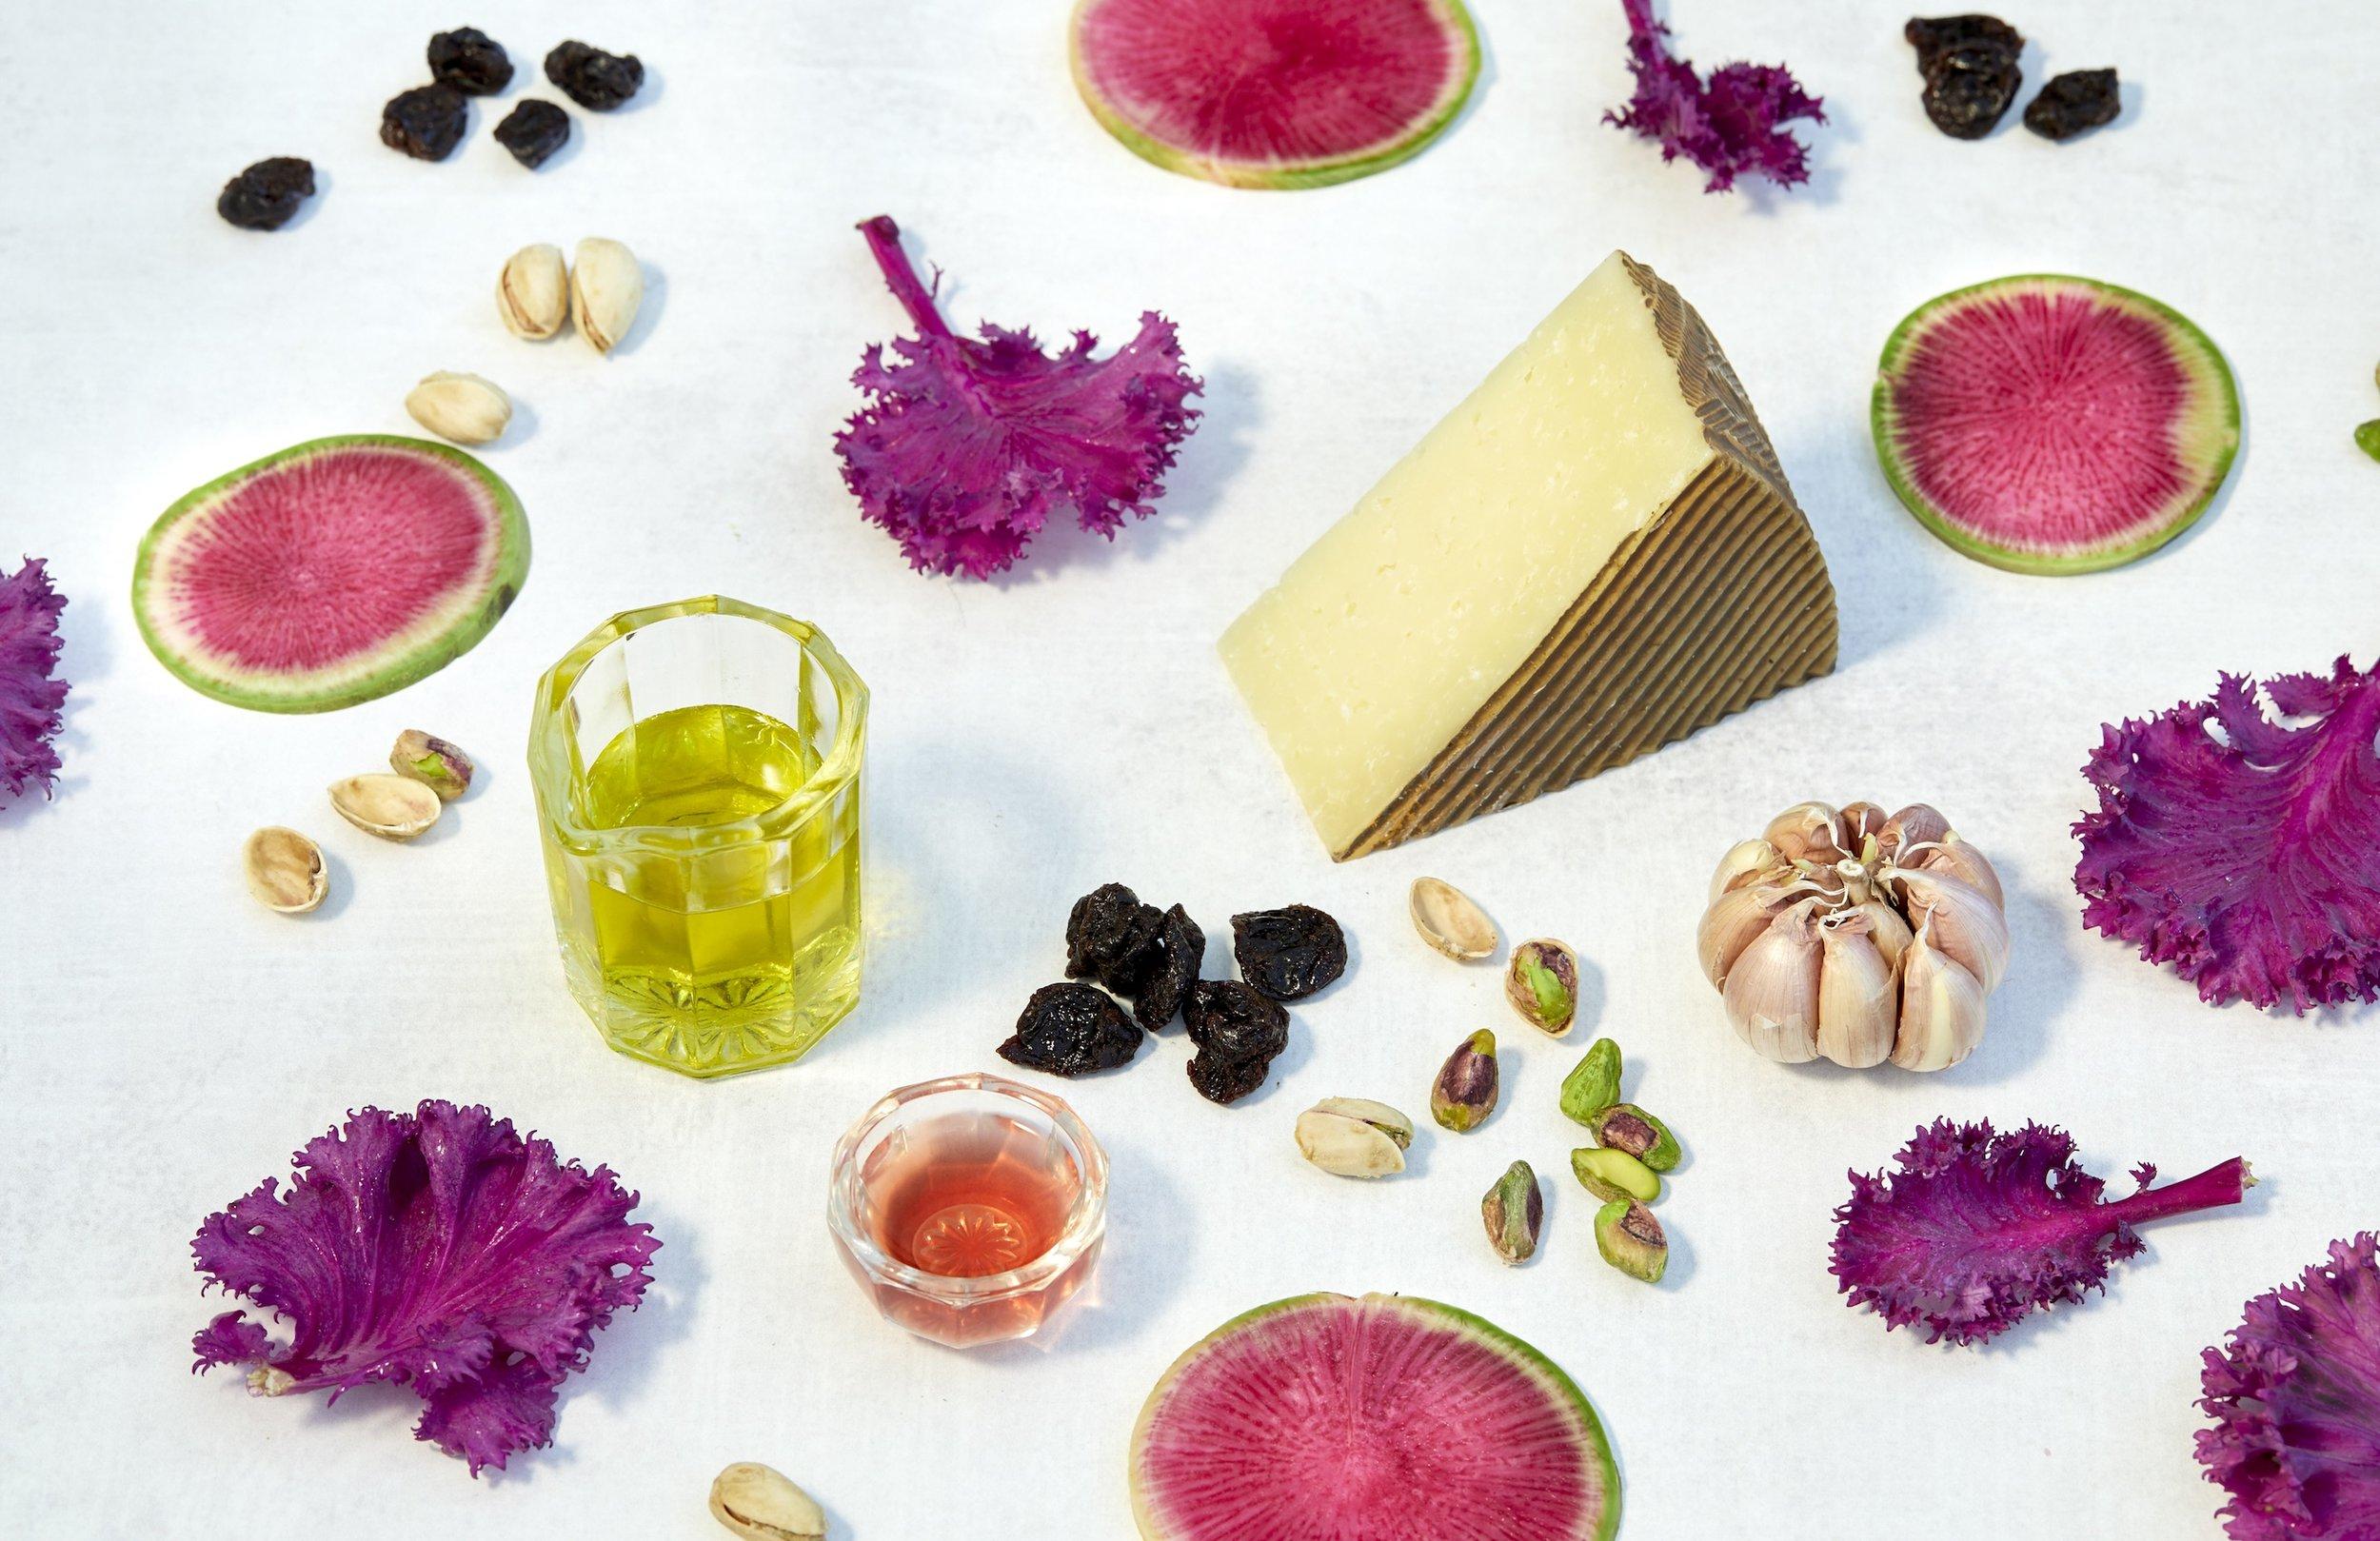 leela's-warm-kale-salad-10_1.jpg